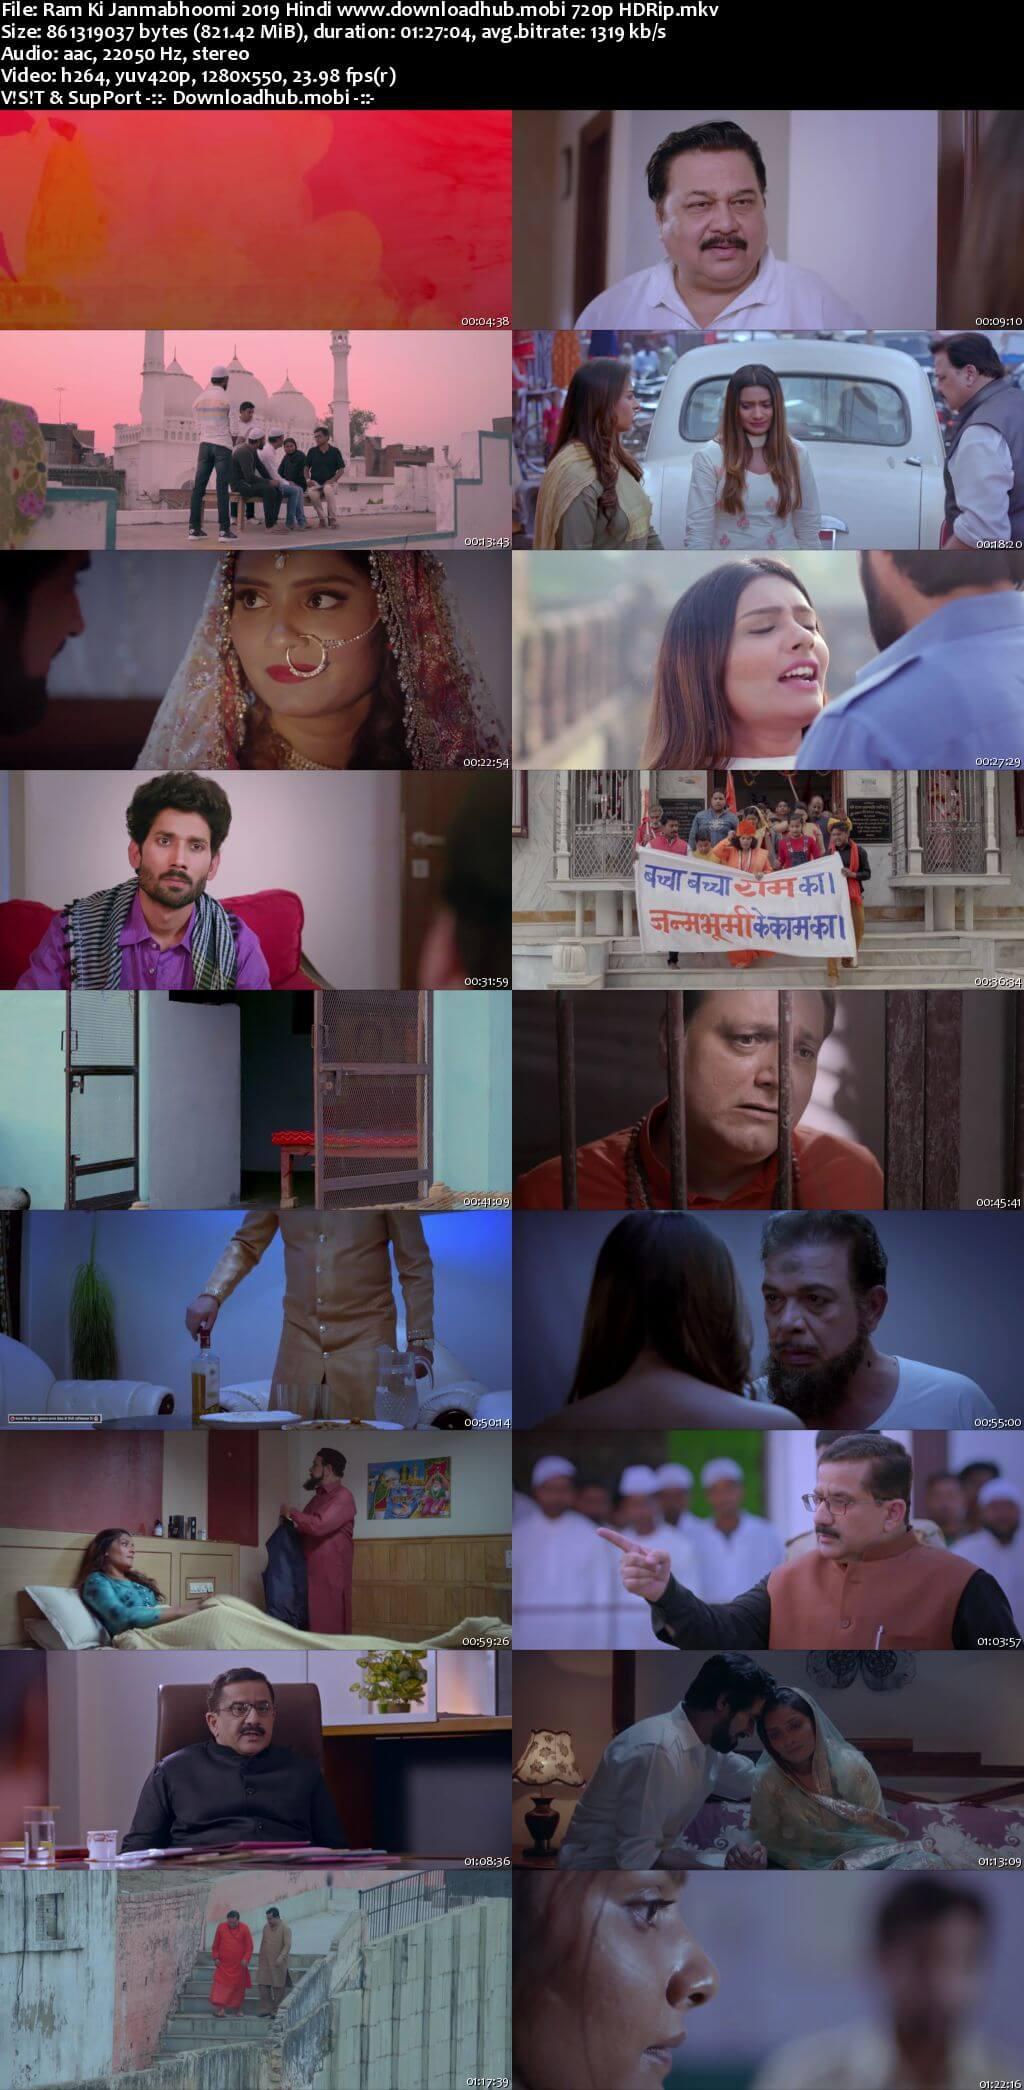 Ram Ki Janmabhoomi 2019 Hindi 720p HDRip x264